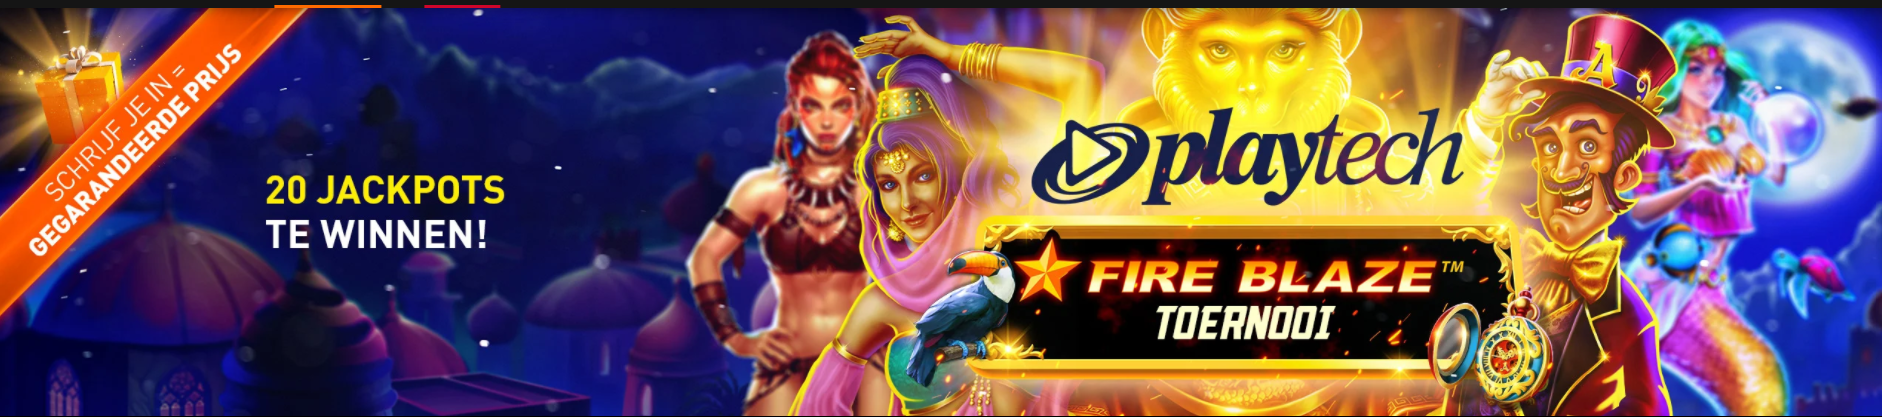 Playtech Fireblaze toernooi 2021 Weekendgames eind februari Casino 777 online speelhal